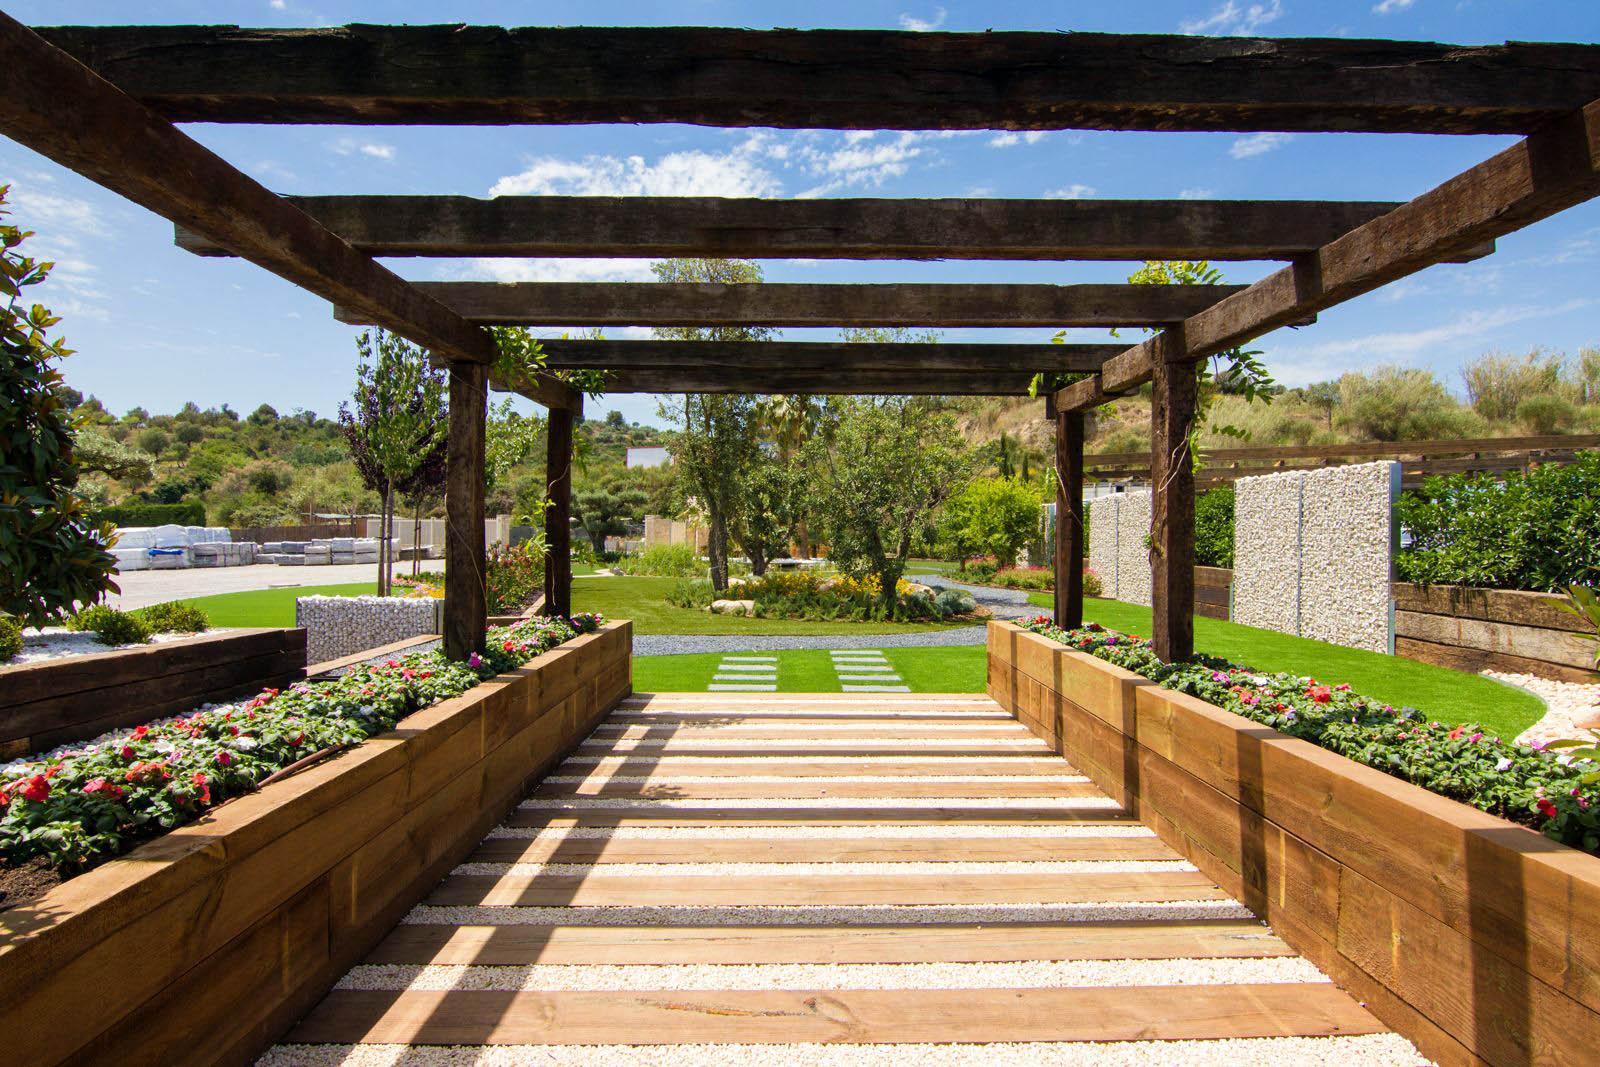 Pergolas-para-jardin-y-terraza-madera-(4)